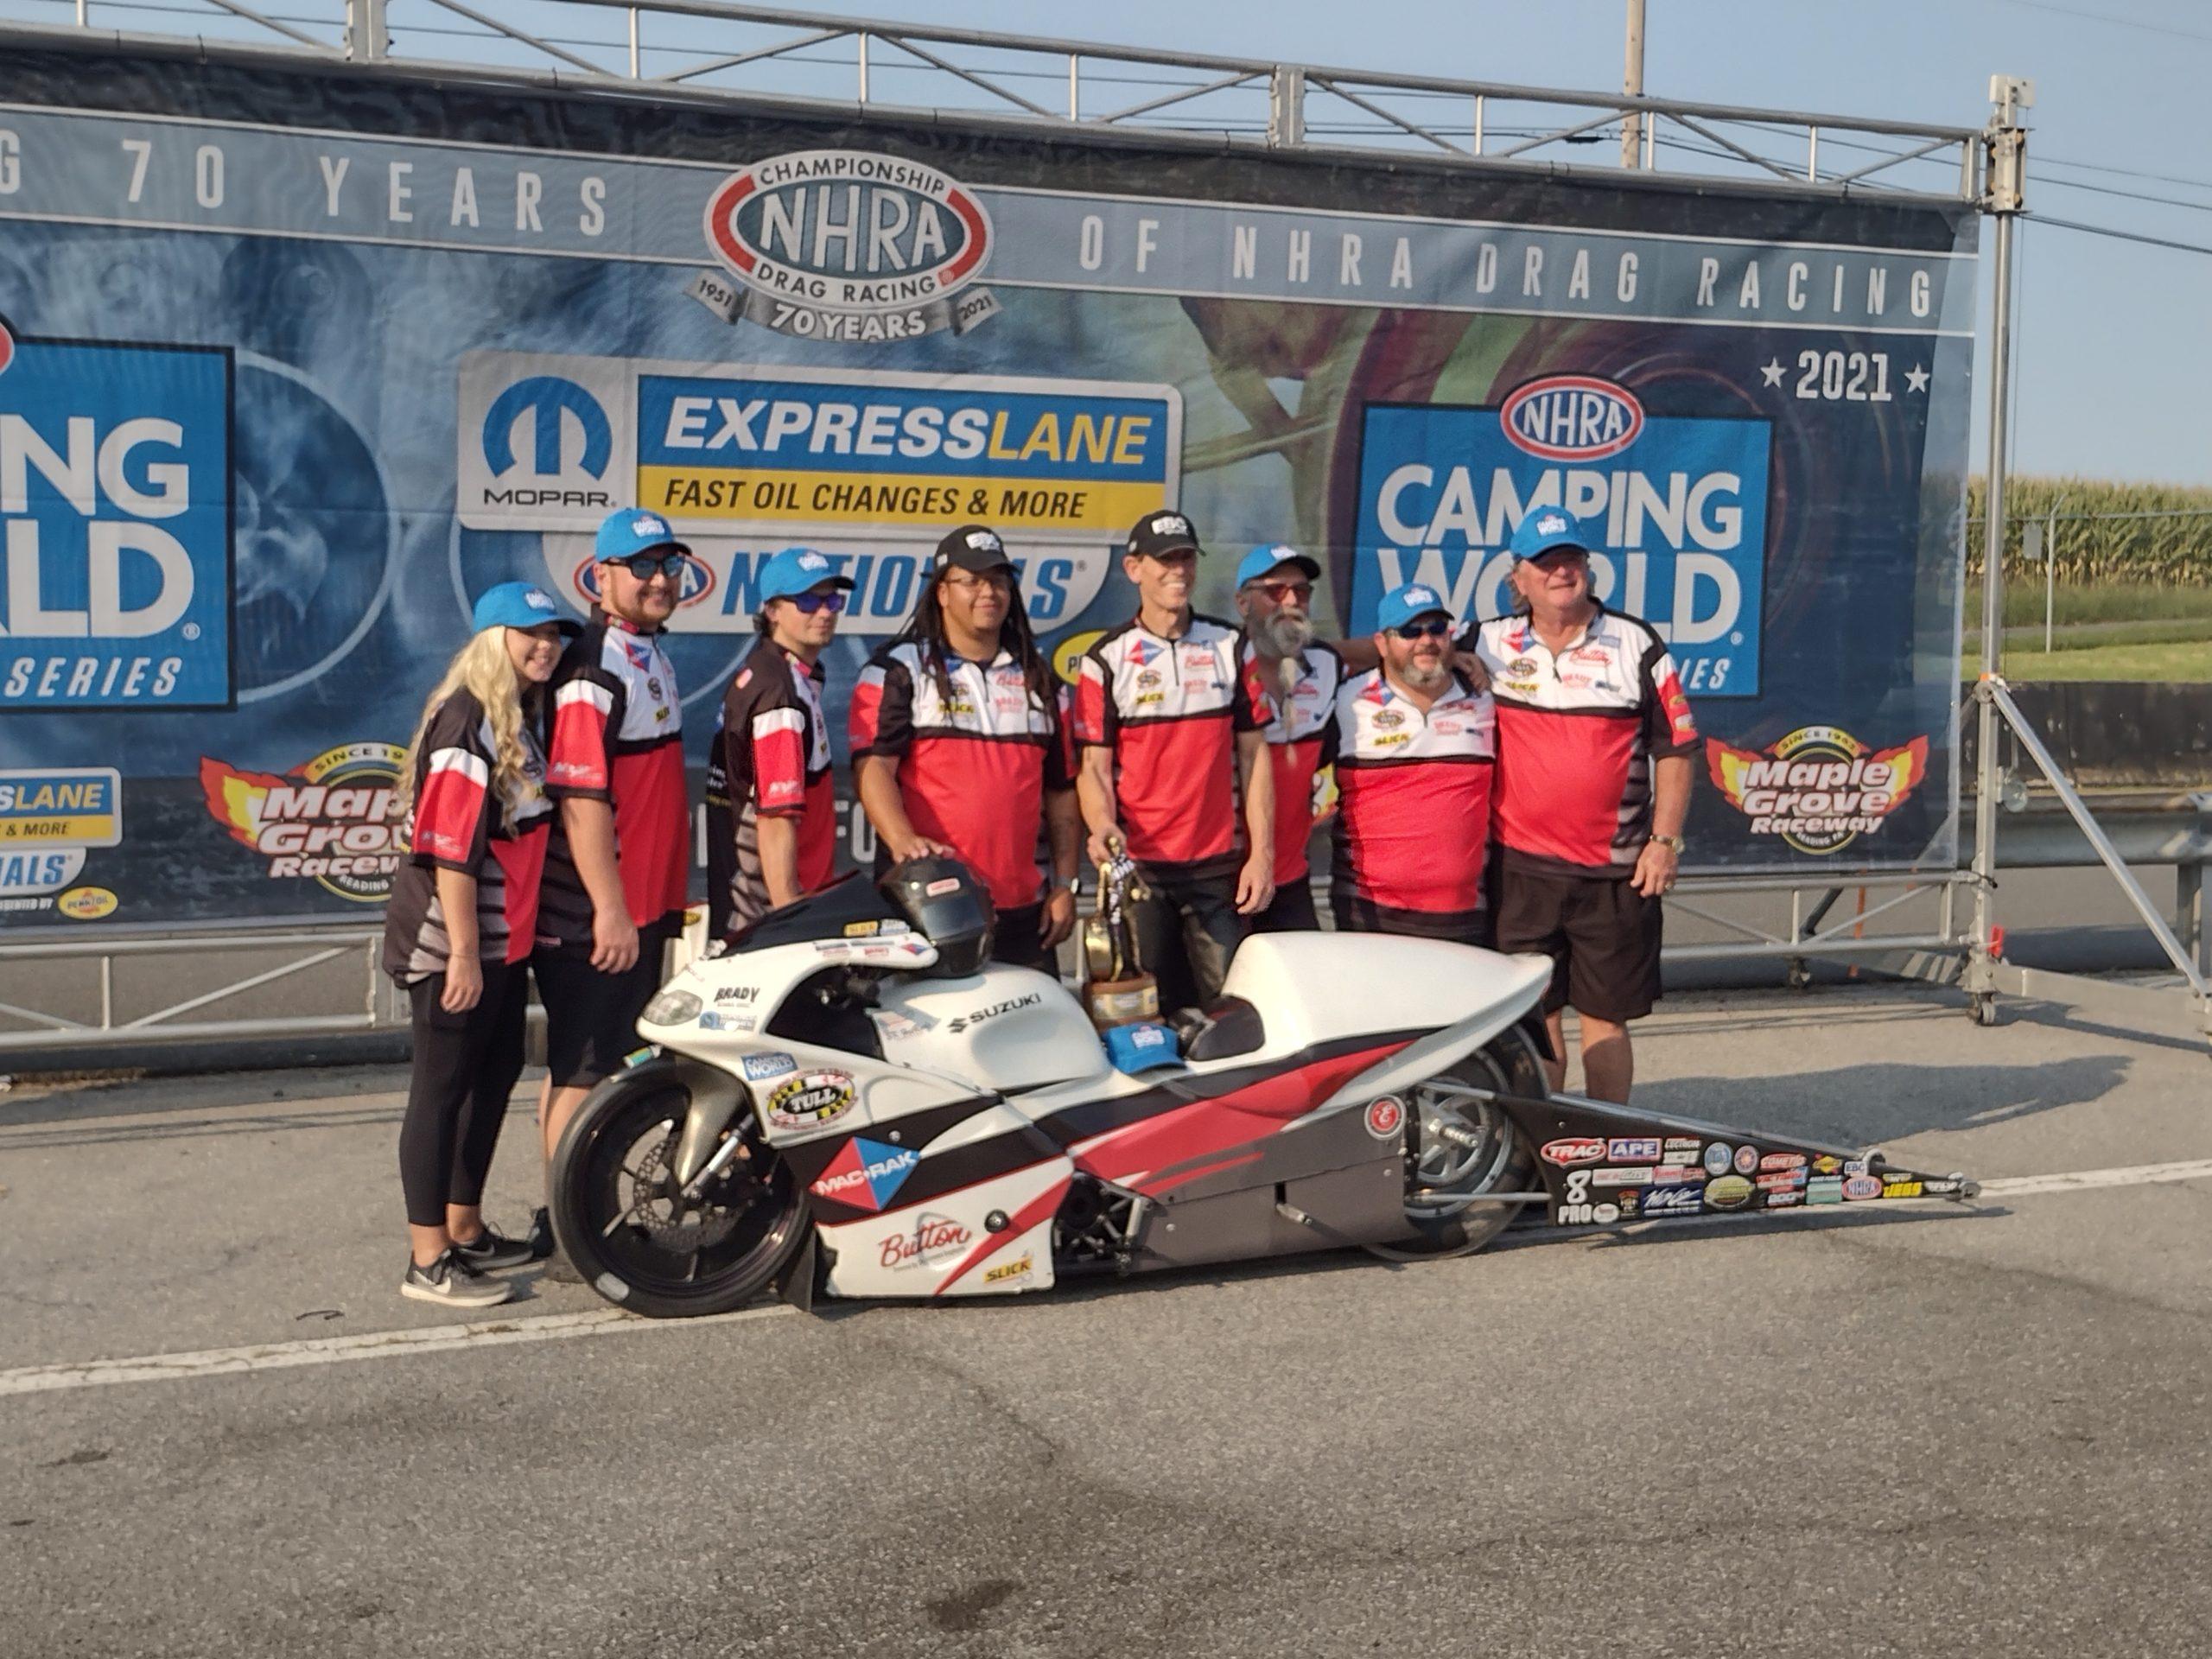 Steve Johnson Wins Pro Stock Motorcycle Drag Race in NHRA Nationals